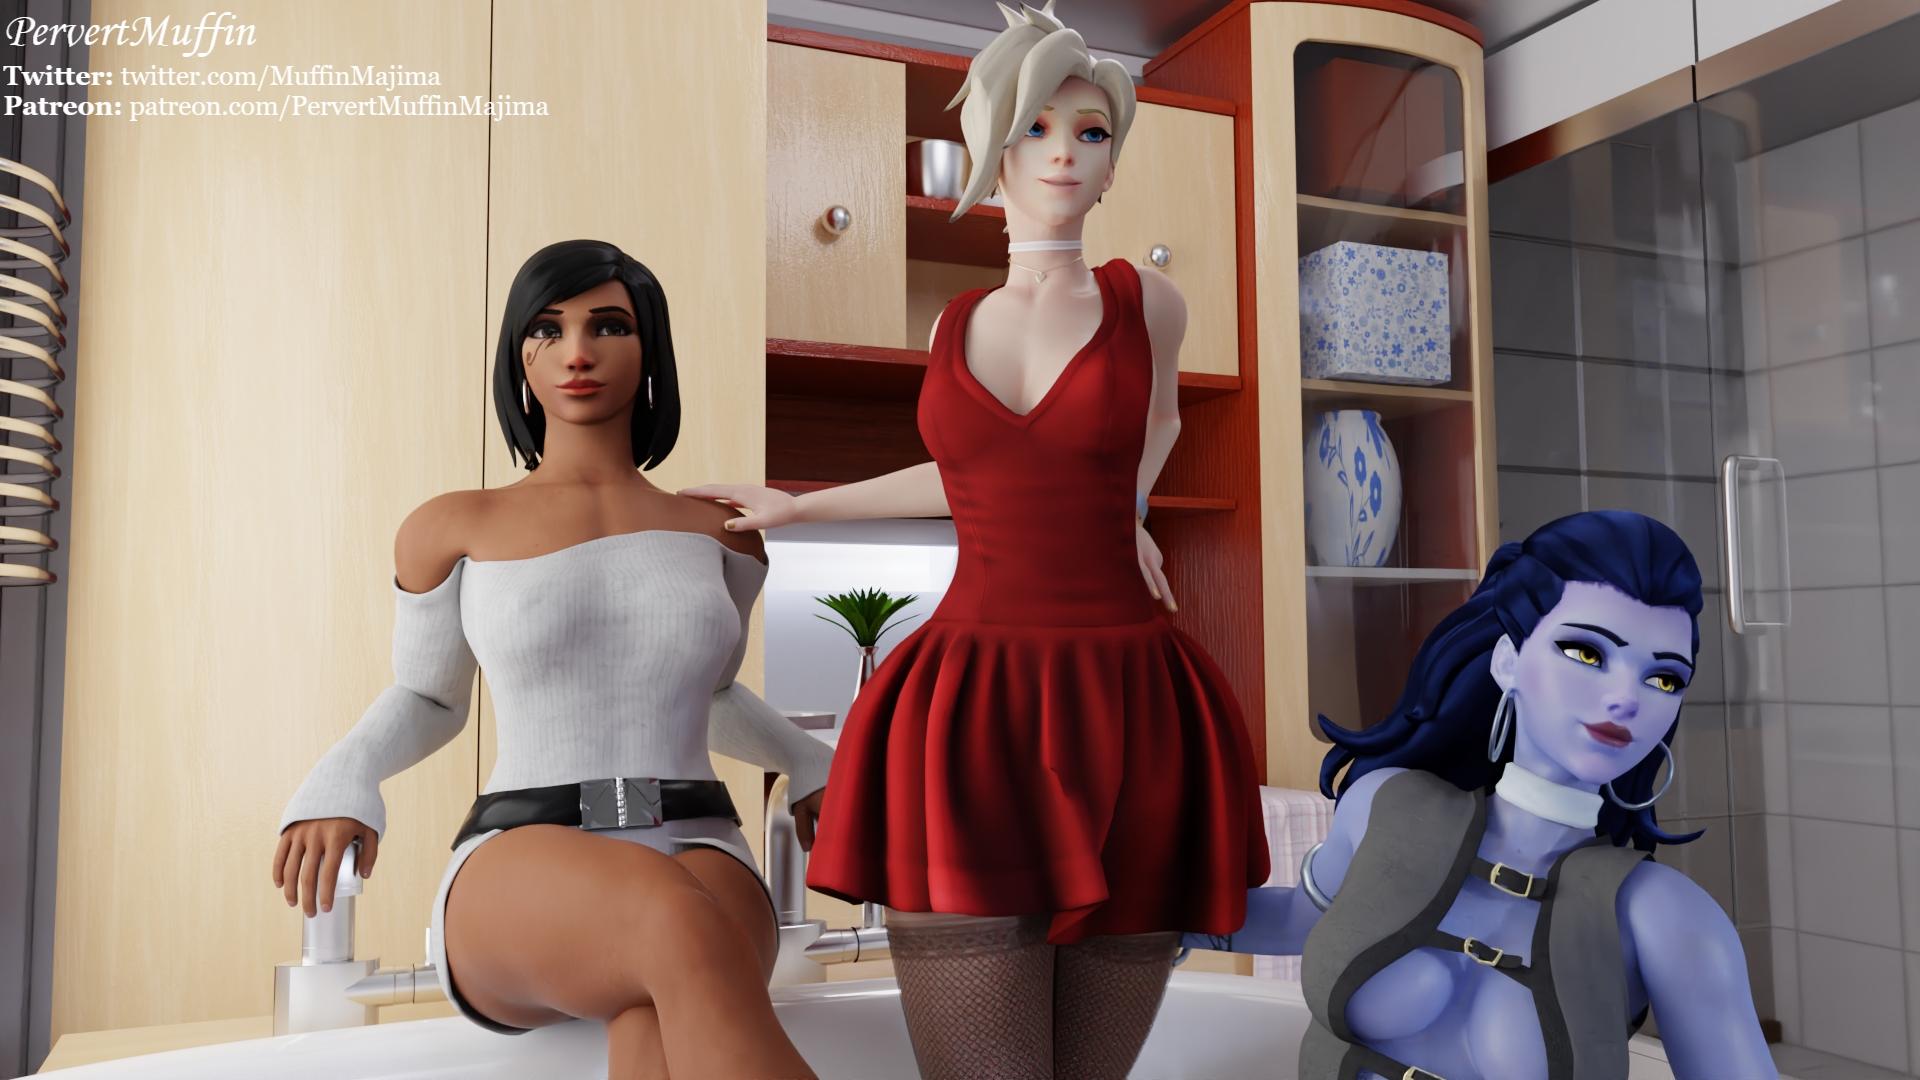 OW Girls On The Bathtub (Dress) - page04 Overwatch,  xxx porn rule34